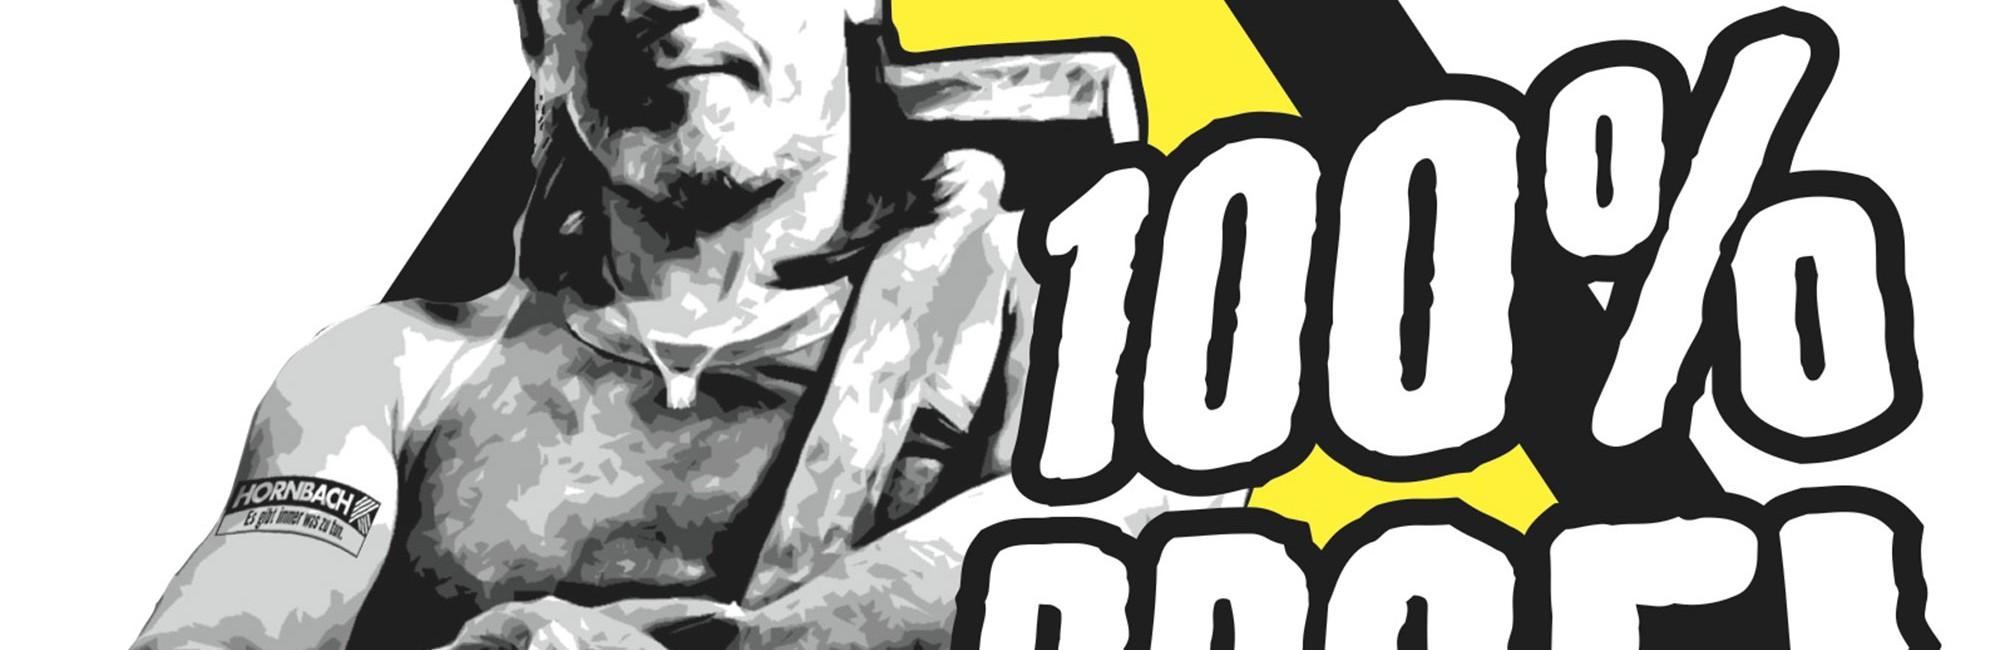 100profihornbach